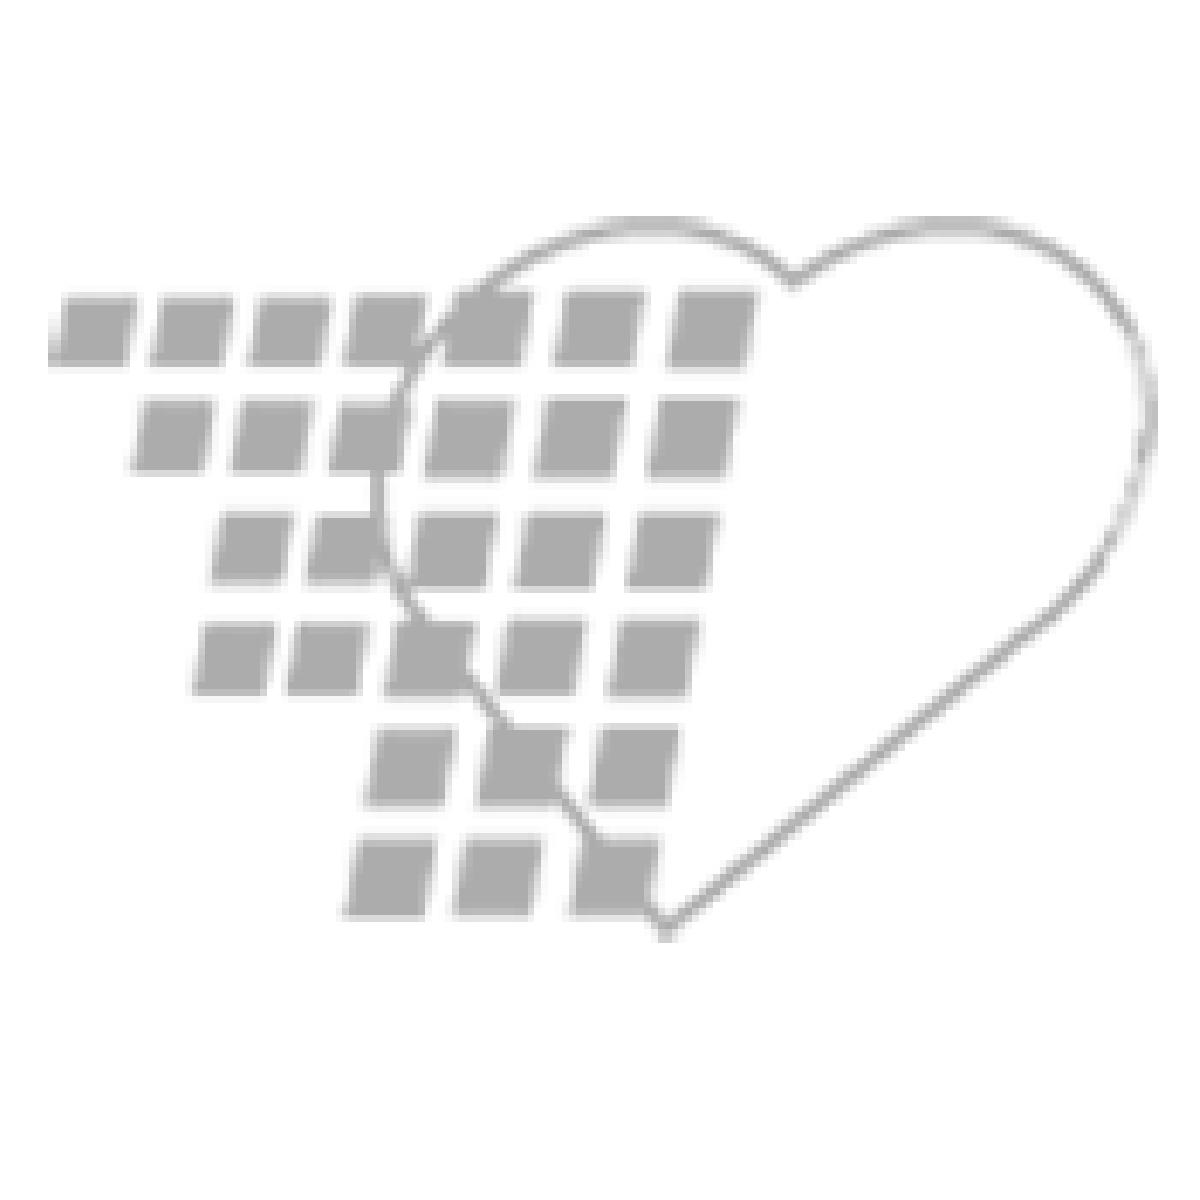 10-81-0120 Human Pregnancy Pelvis Model